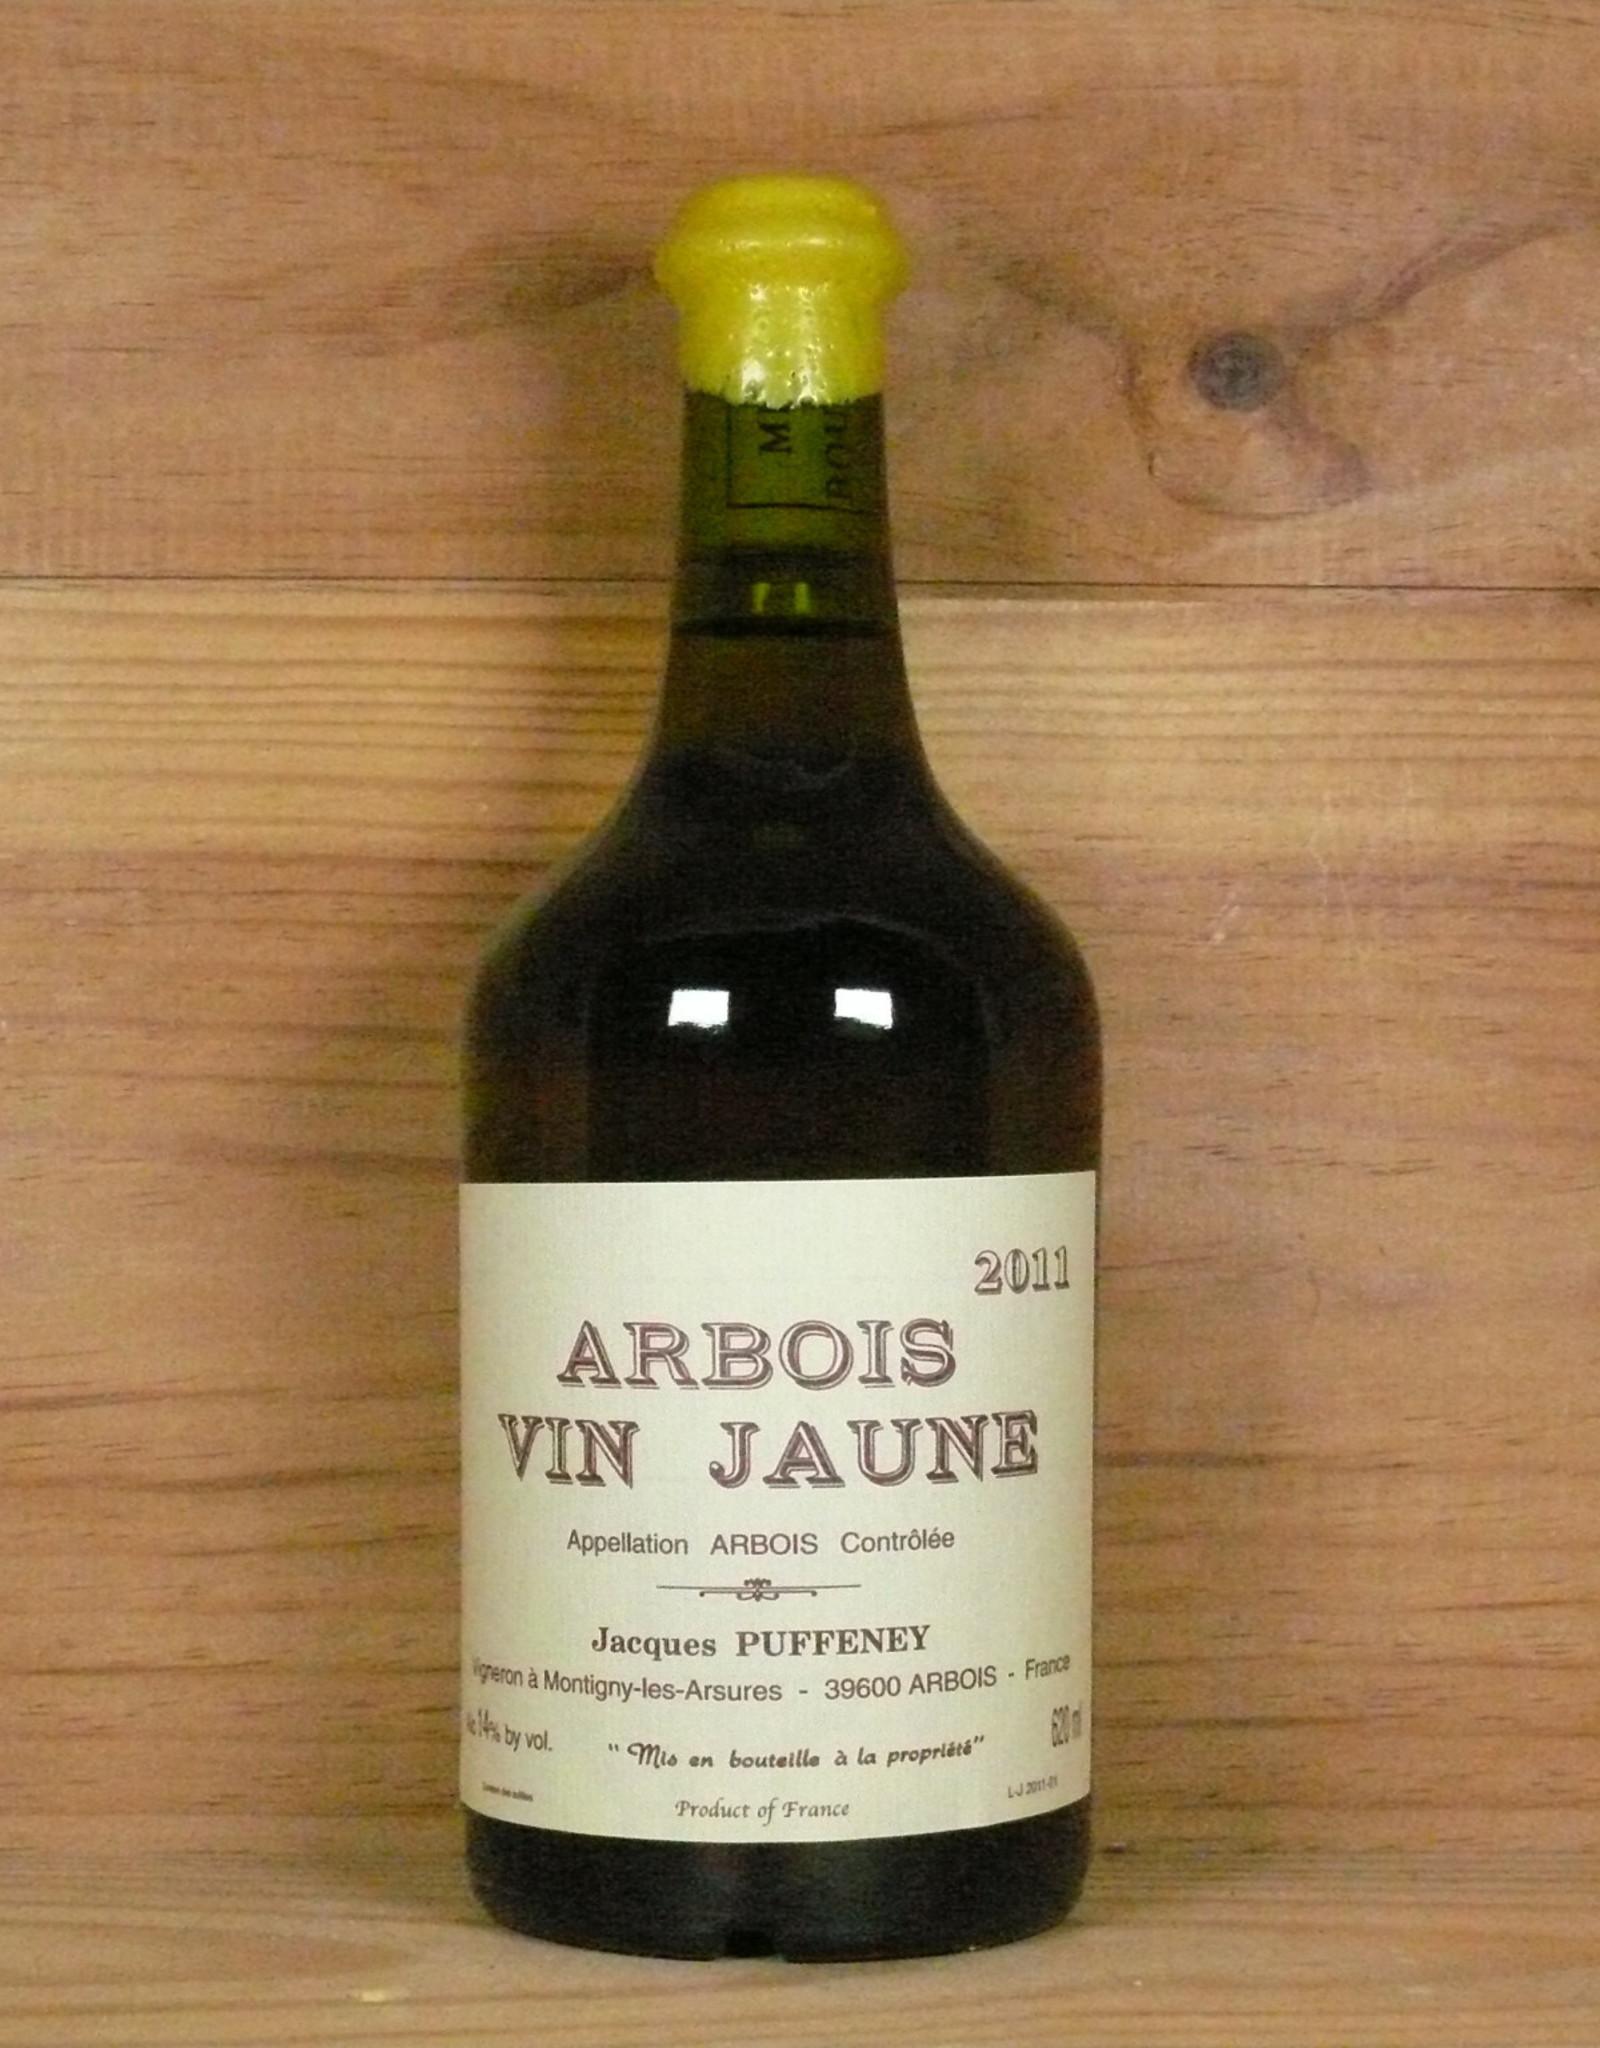 Jacques Puffeney - Vin Jaune 2011